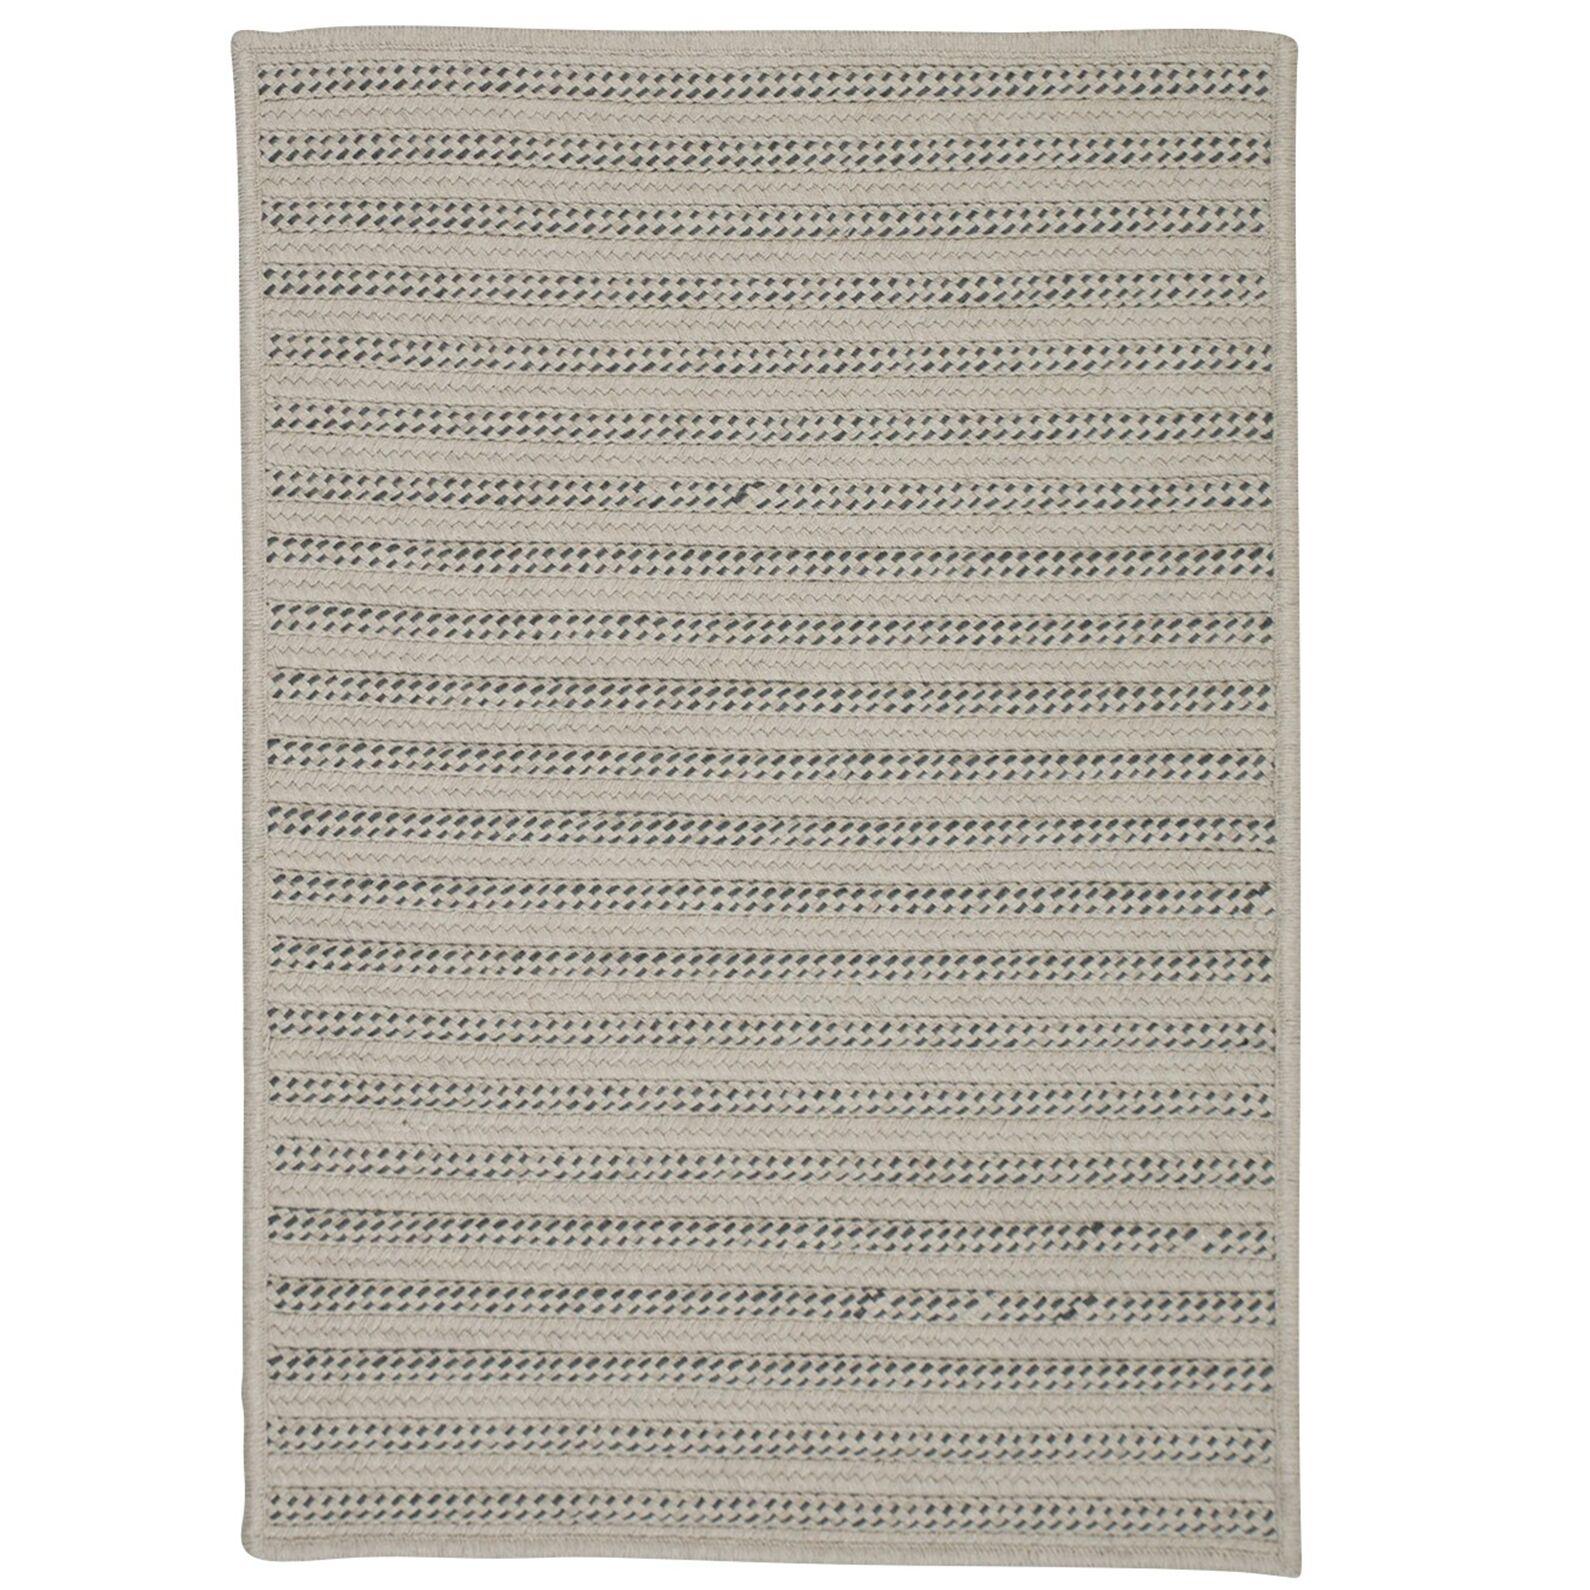 Tidewater Reversible Hand-Woven Natural Indoor/Outdoor Area Rug Rug Size: 6' x 9'